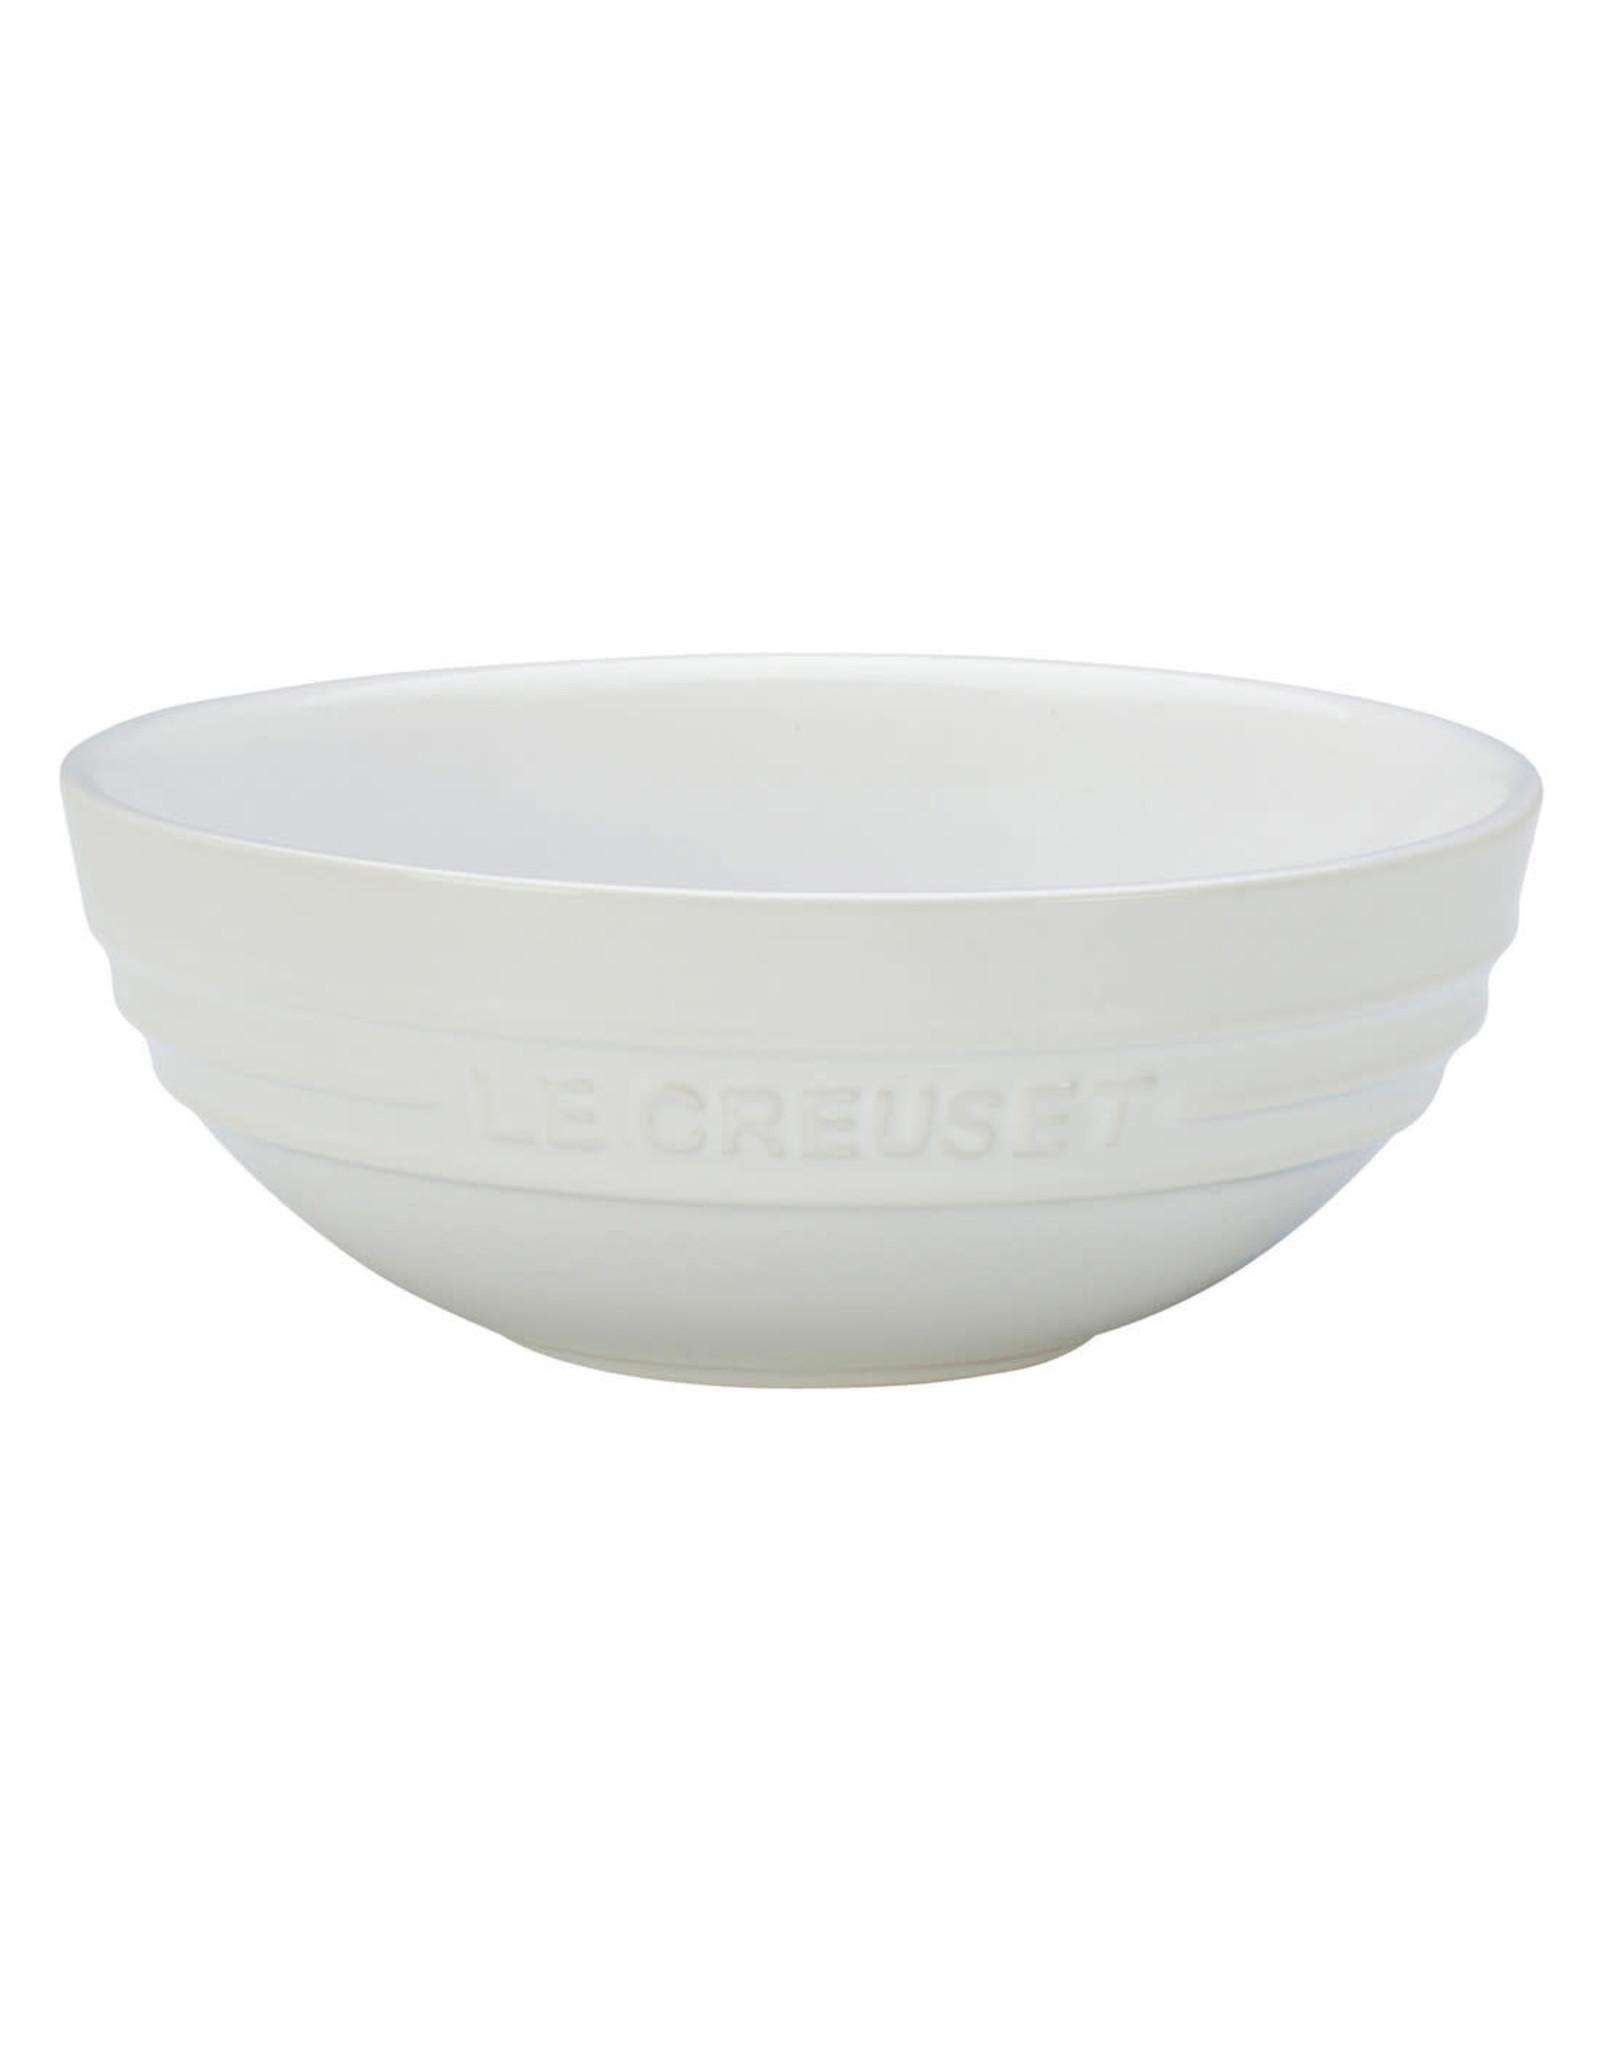 Le Creuset Le Creuset Small Multi Bowl White